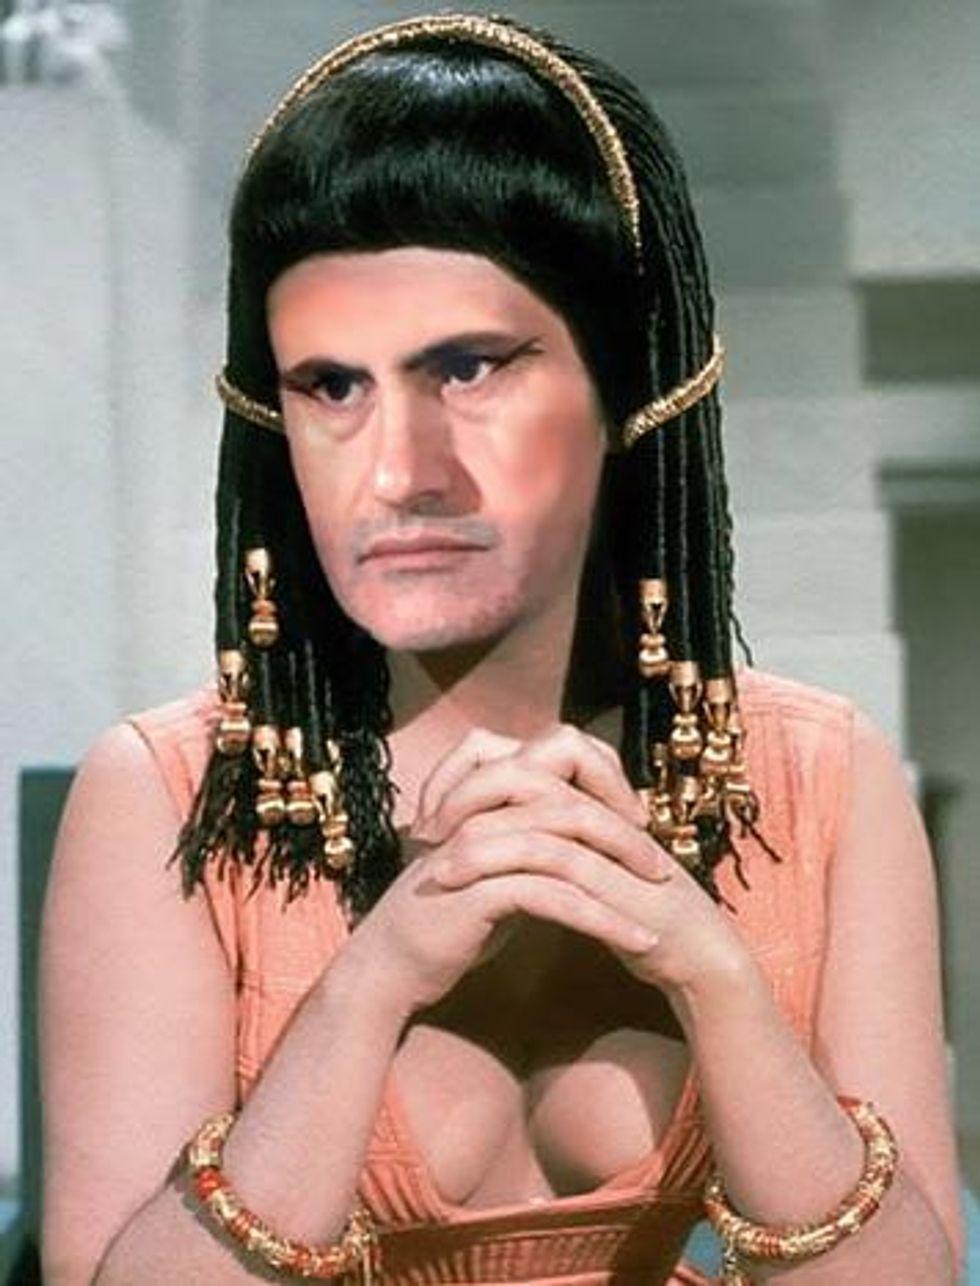 Alemanno, sindaco d'Egitto. #Cleopatra non arriva e Twitter si diverte